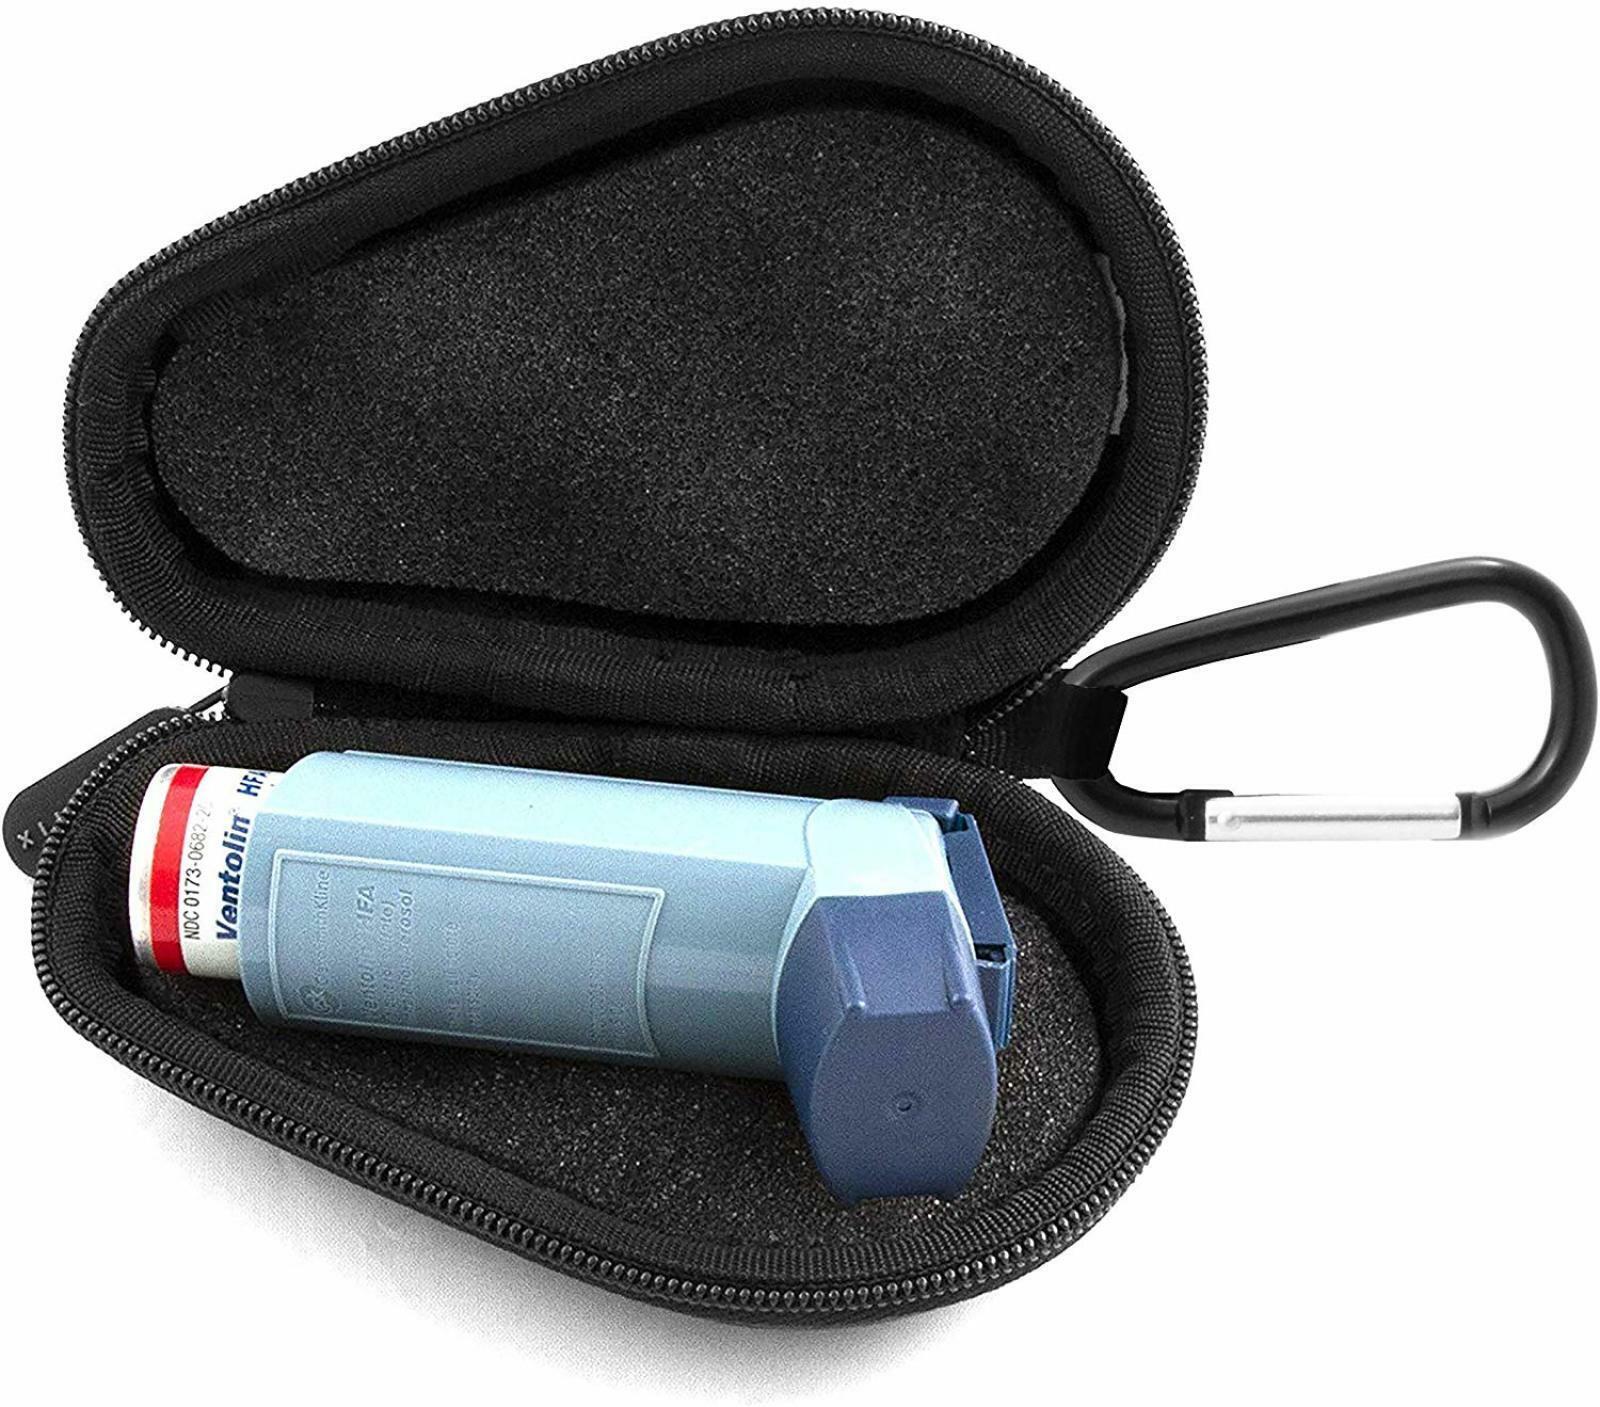 Protective Portable Health Inhaler Asthma Medicine Travel Carrying Case Storage